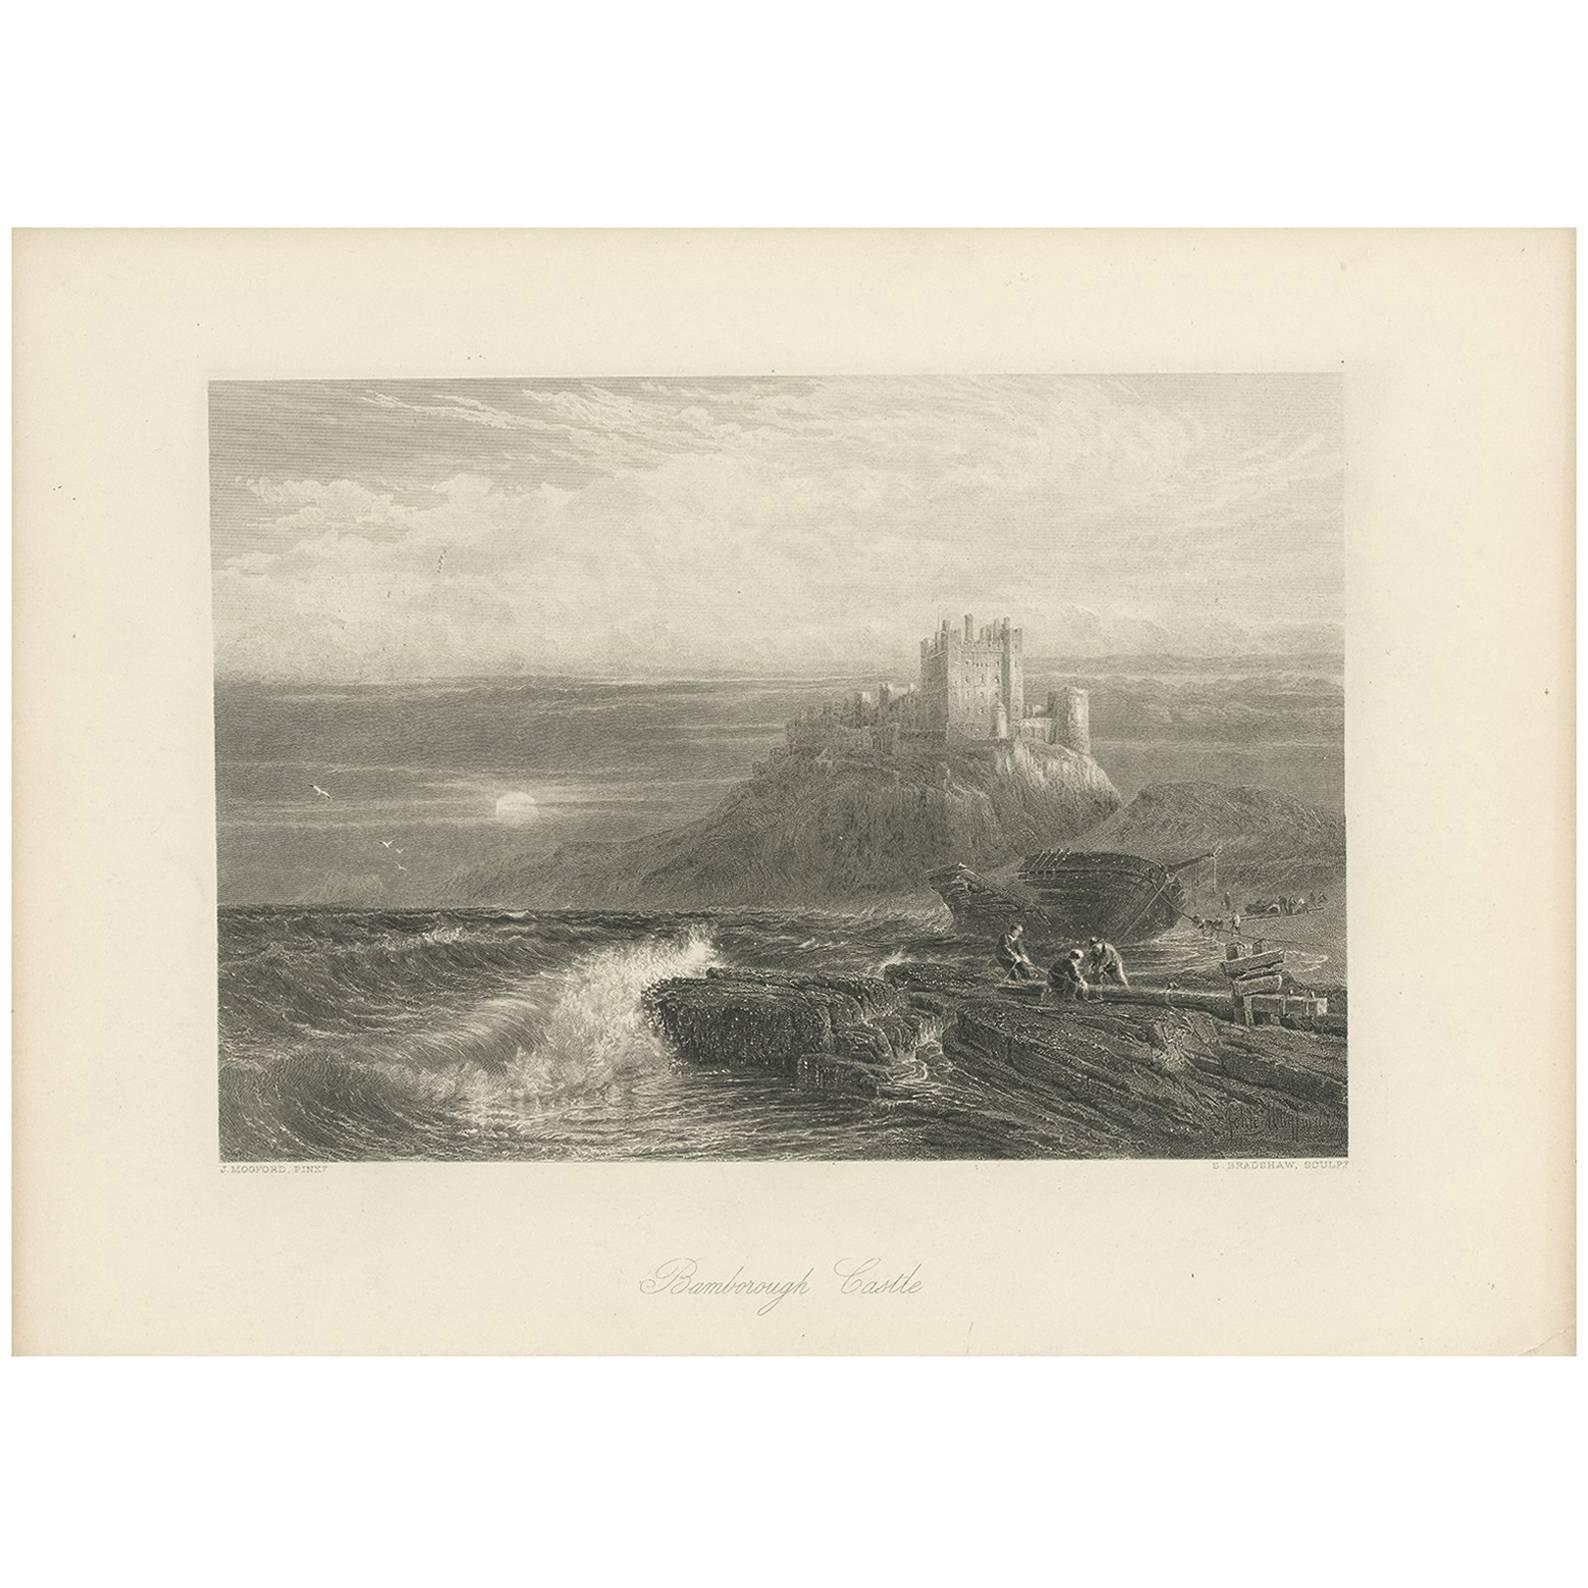 Antique Print of Bamburgh Castle by J. Godfrey, circa 1875